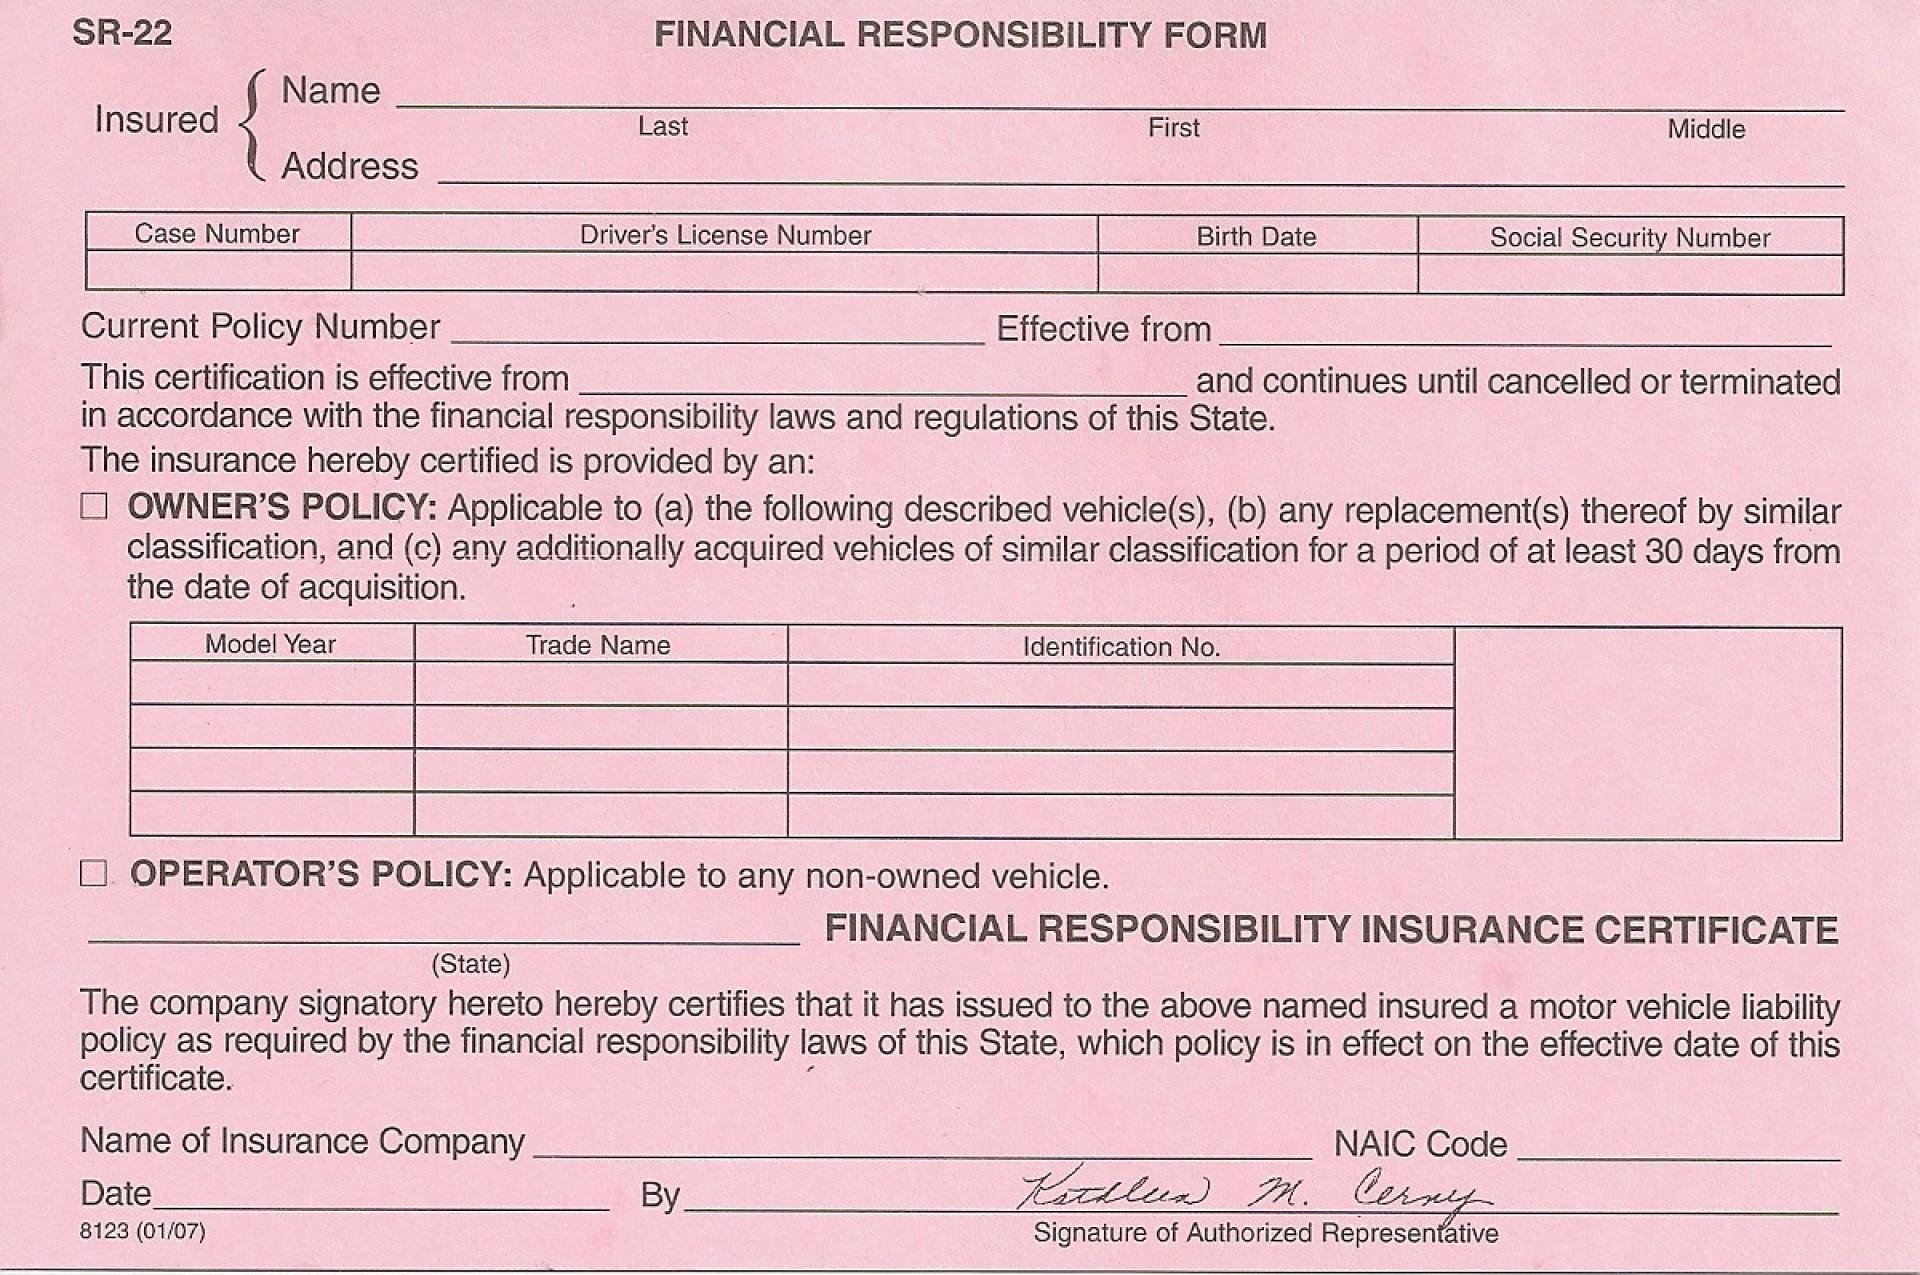 Sr22 Insurance Form Florida